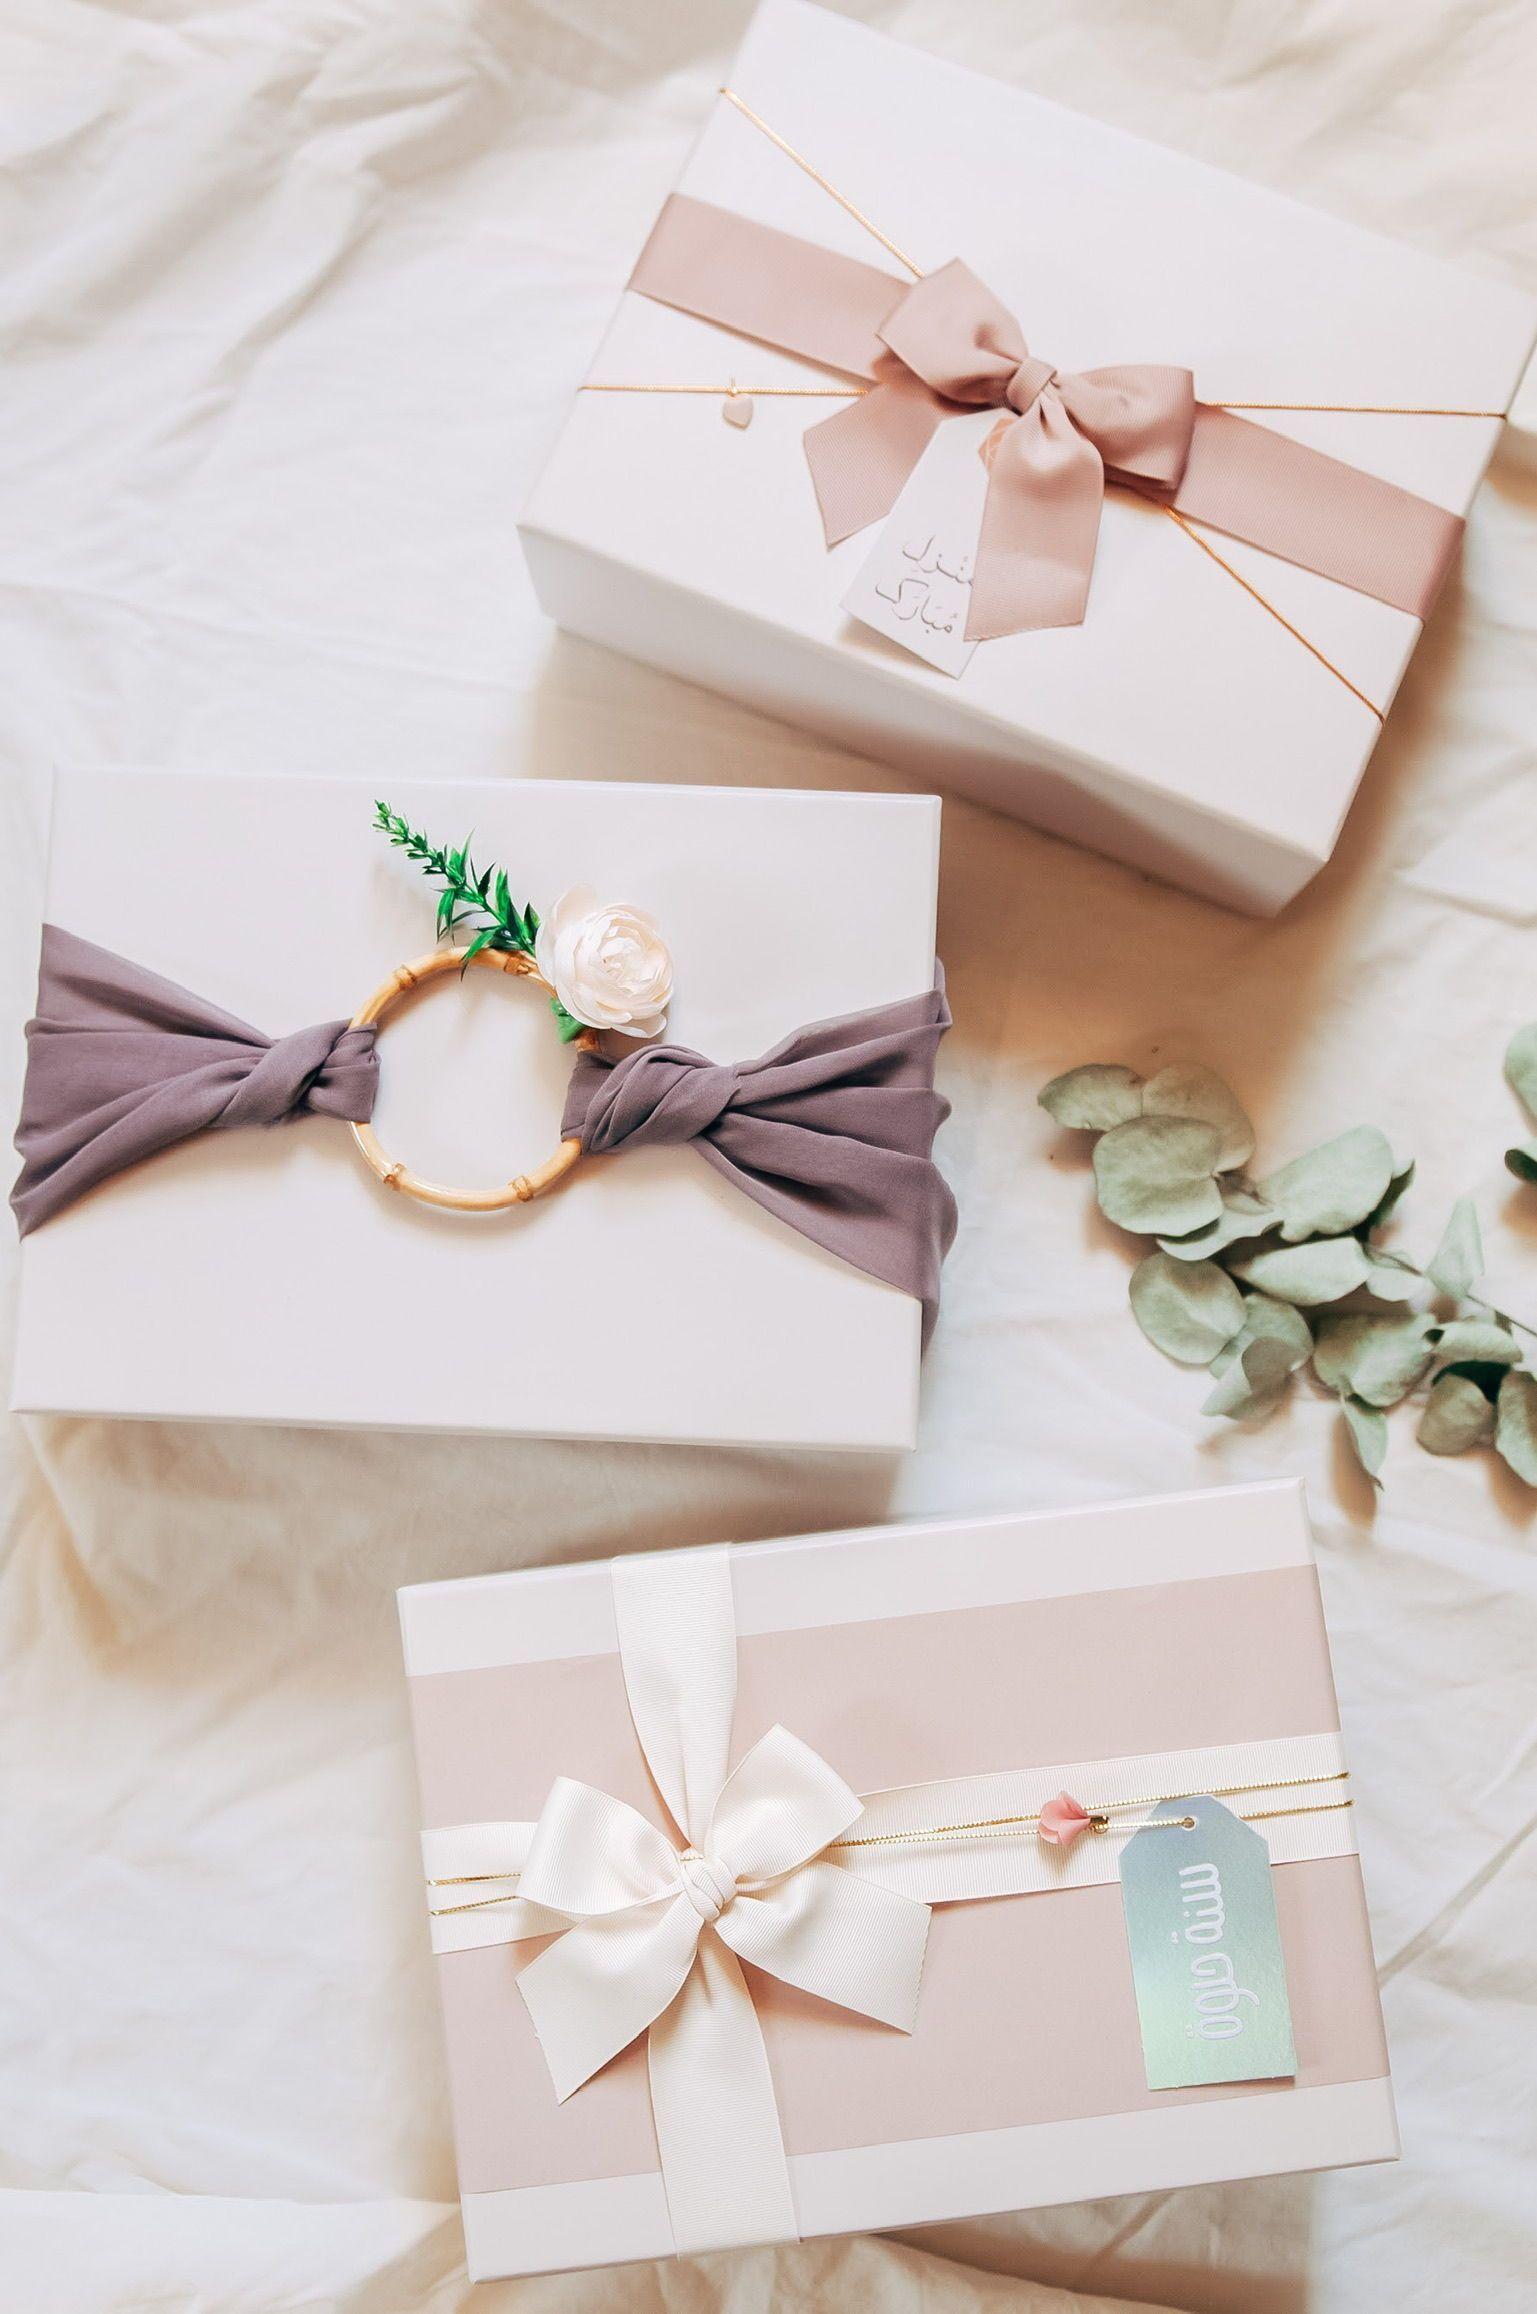 Pin On Women Gifts هدايا نسائية